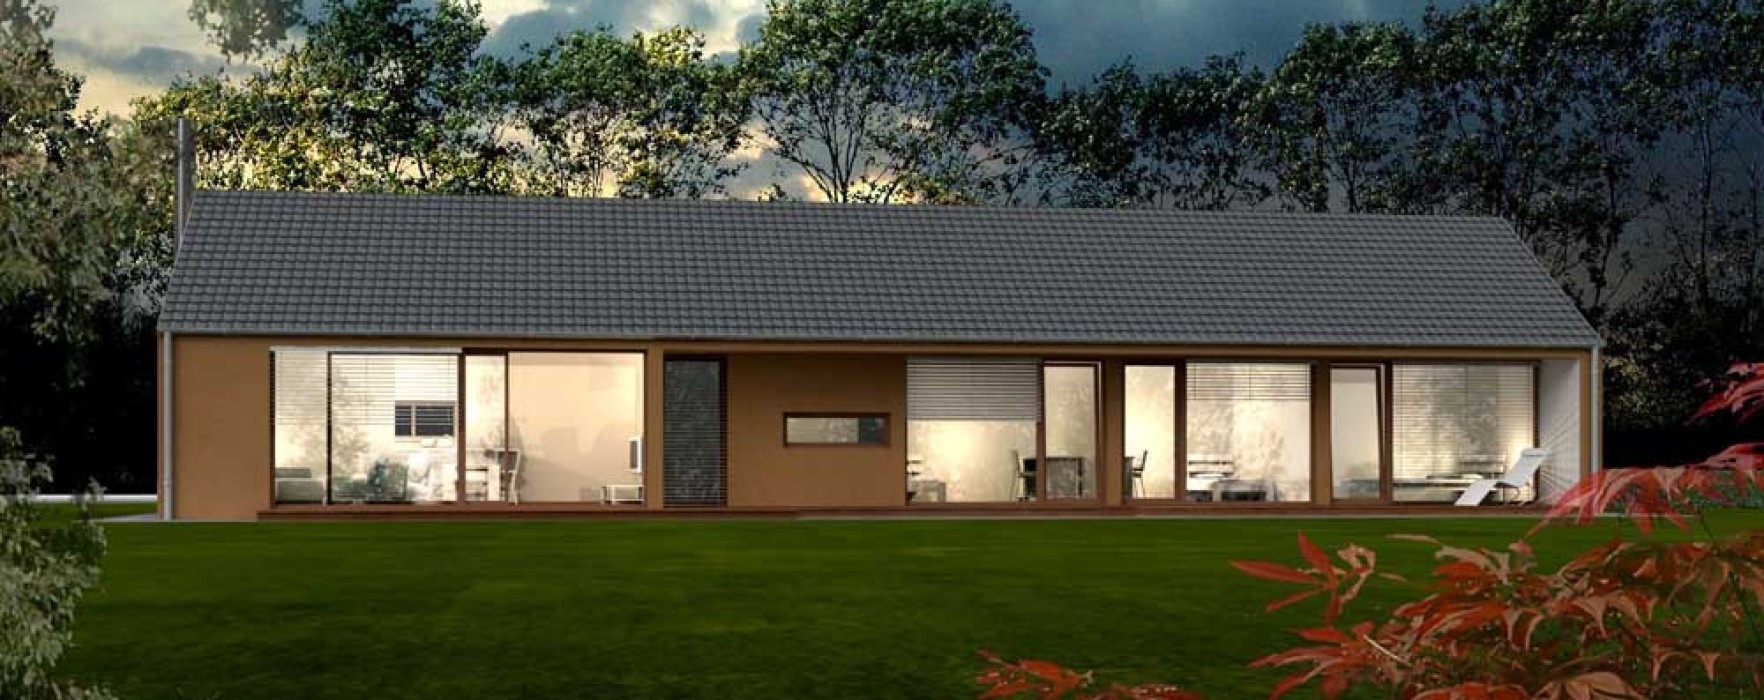 Prezzi indicativi per due case prefabbricate - Casa in legno prezzi ...